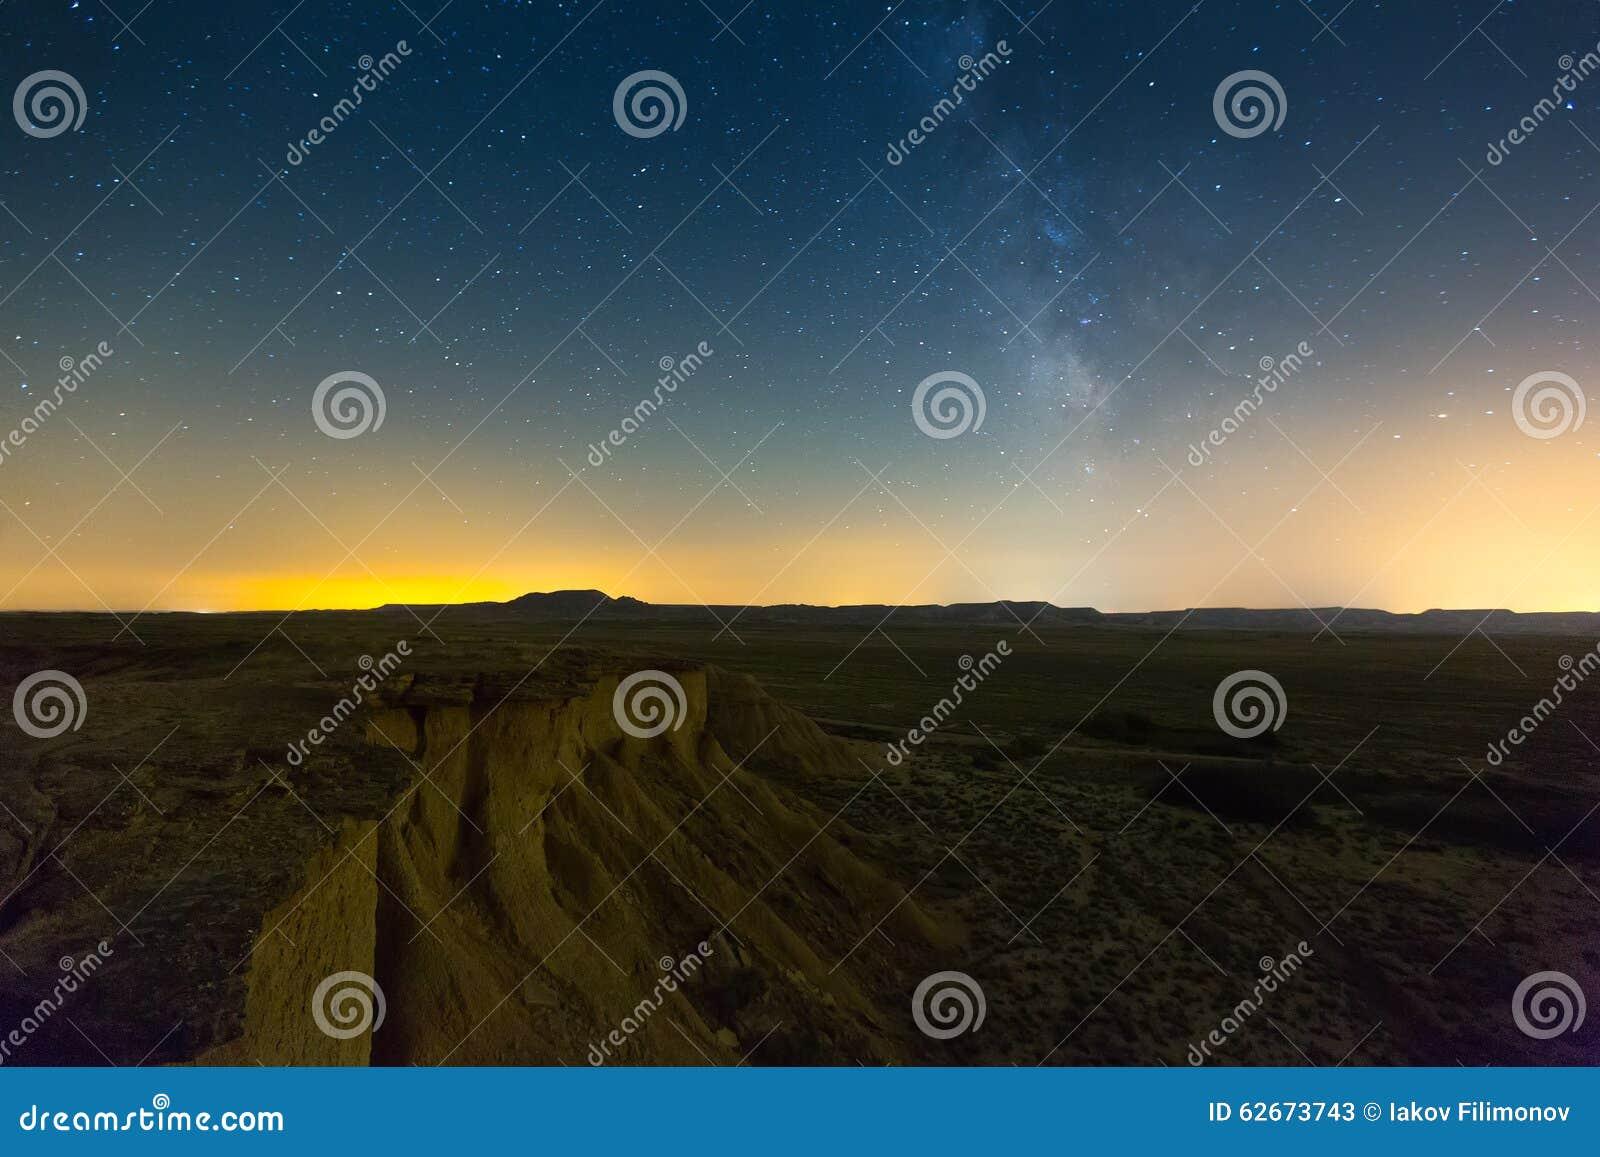 Paisaje Del Desierto En Noche Navarra Imagen De Archivo Imagen De